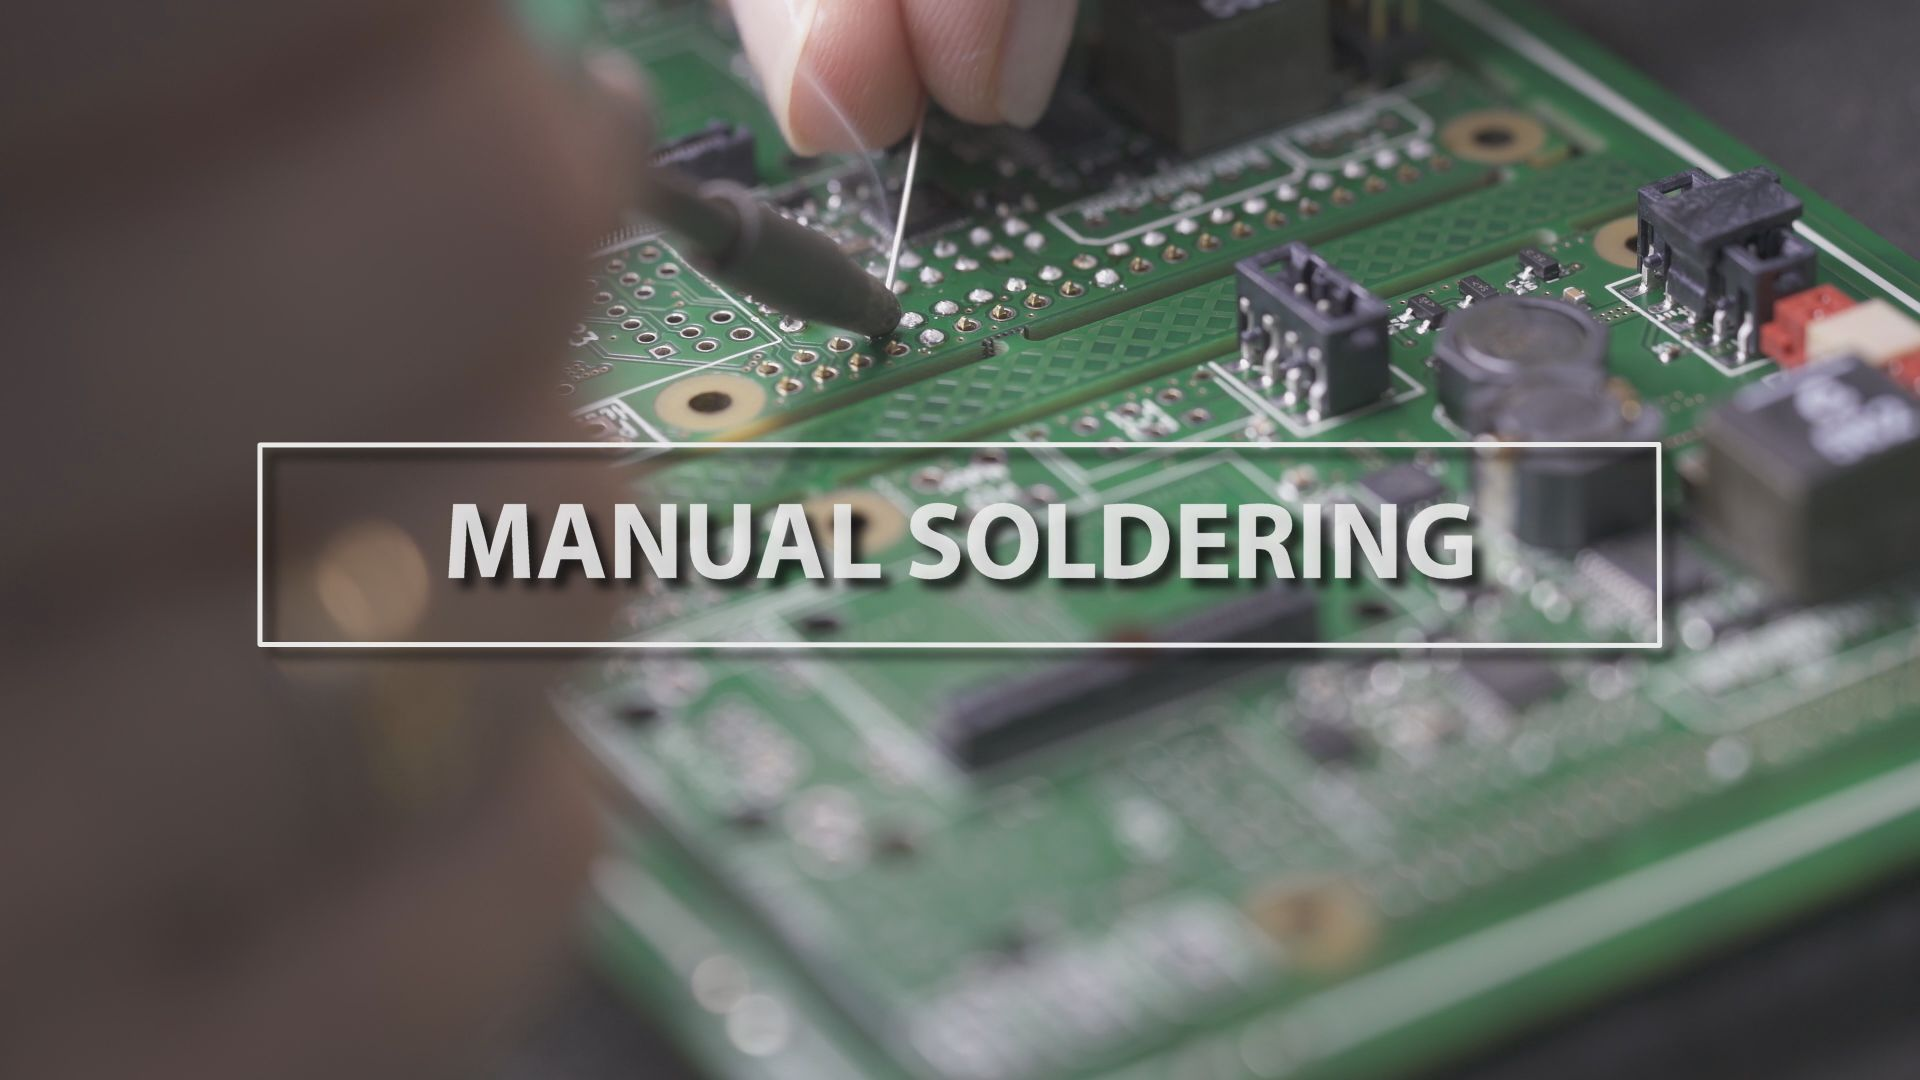 Technology Thursday: Manual Soldering